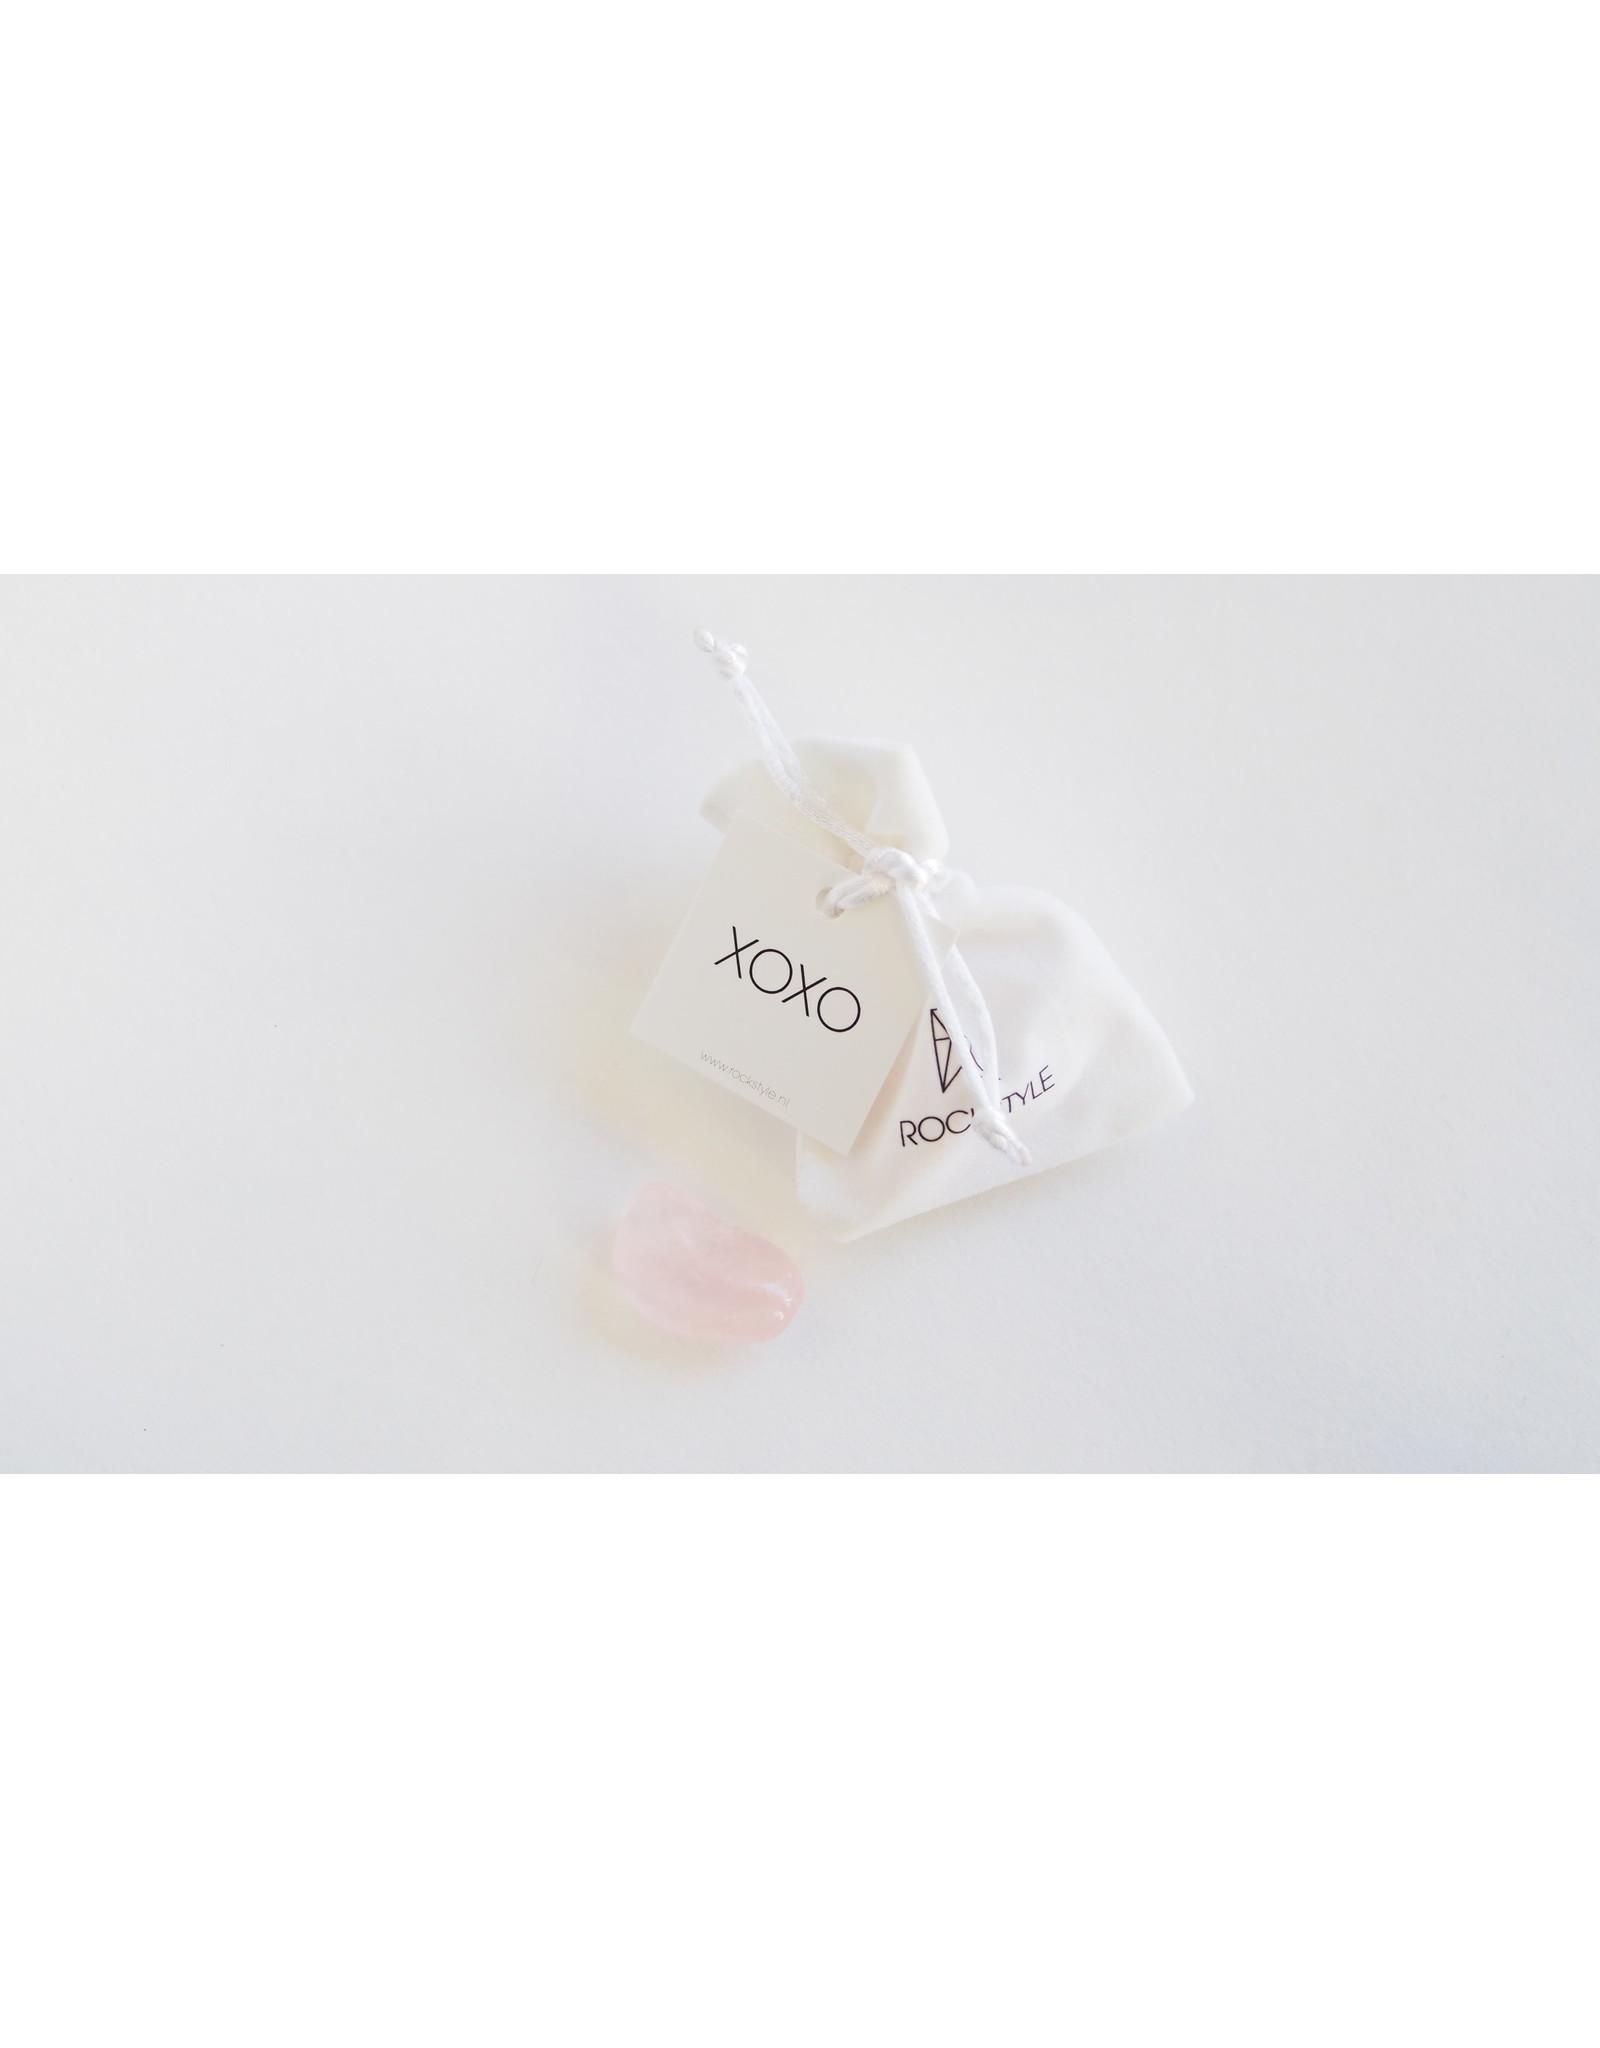 Rockstyle Knuffelsteen - XOXO  (roze kwarts)